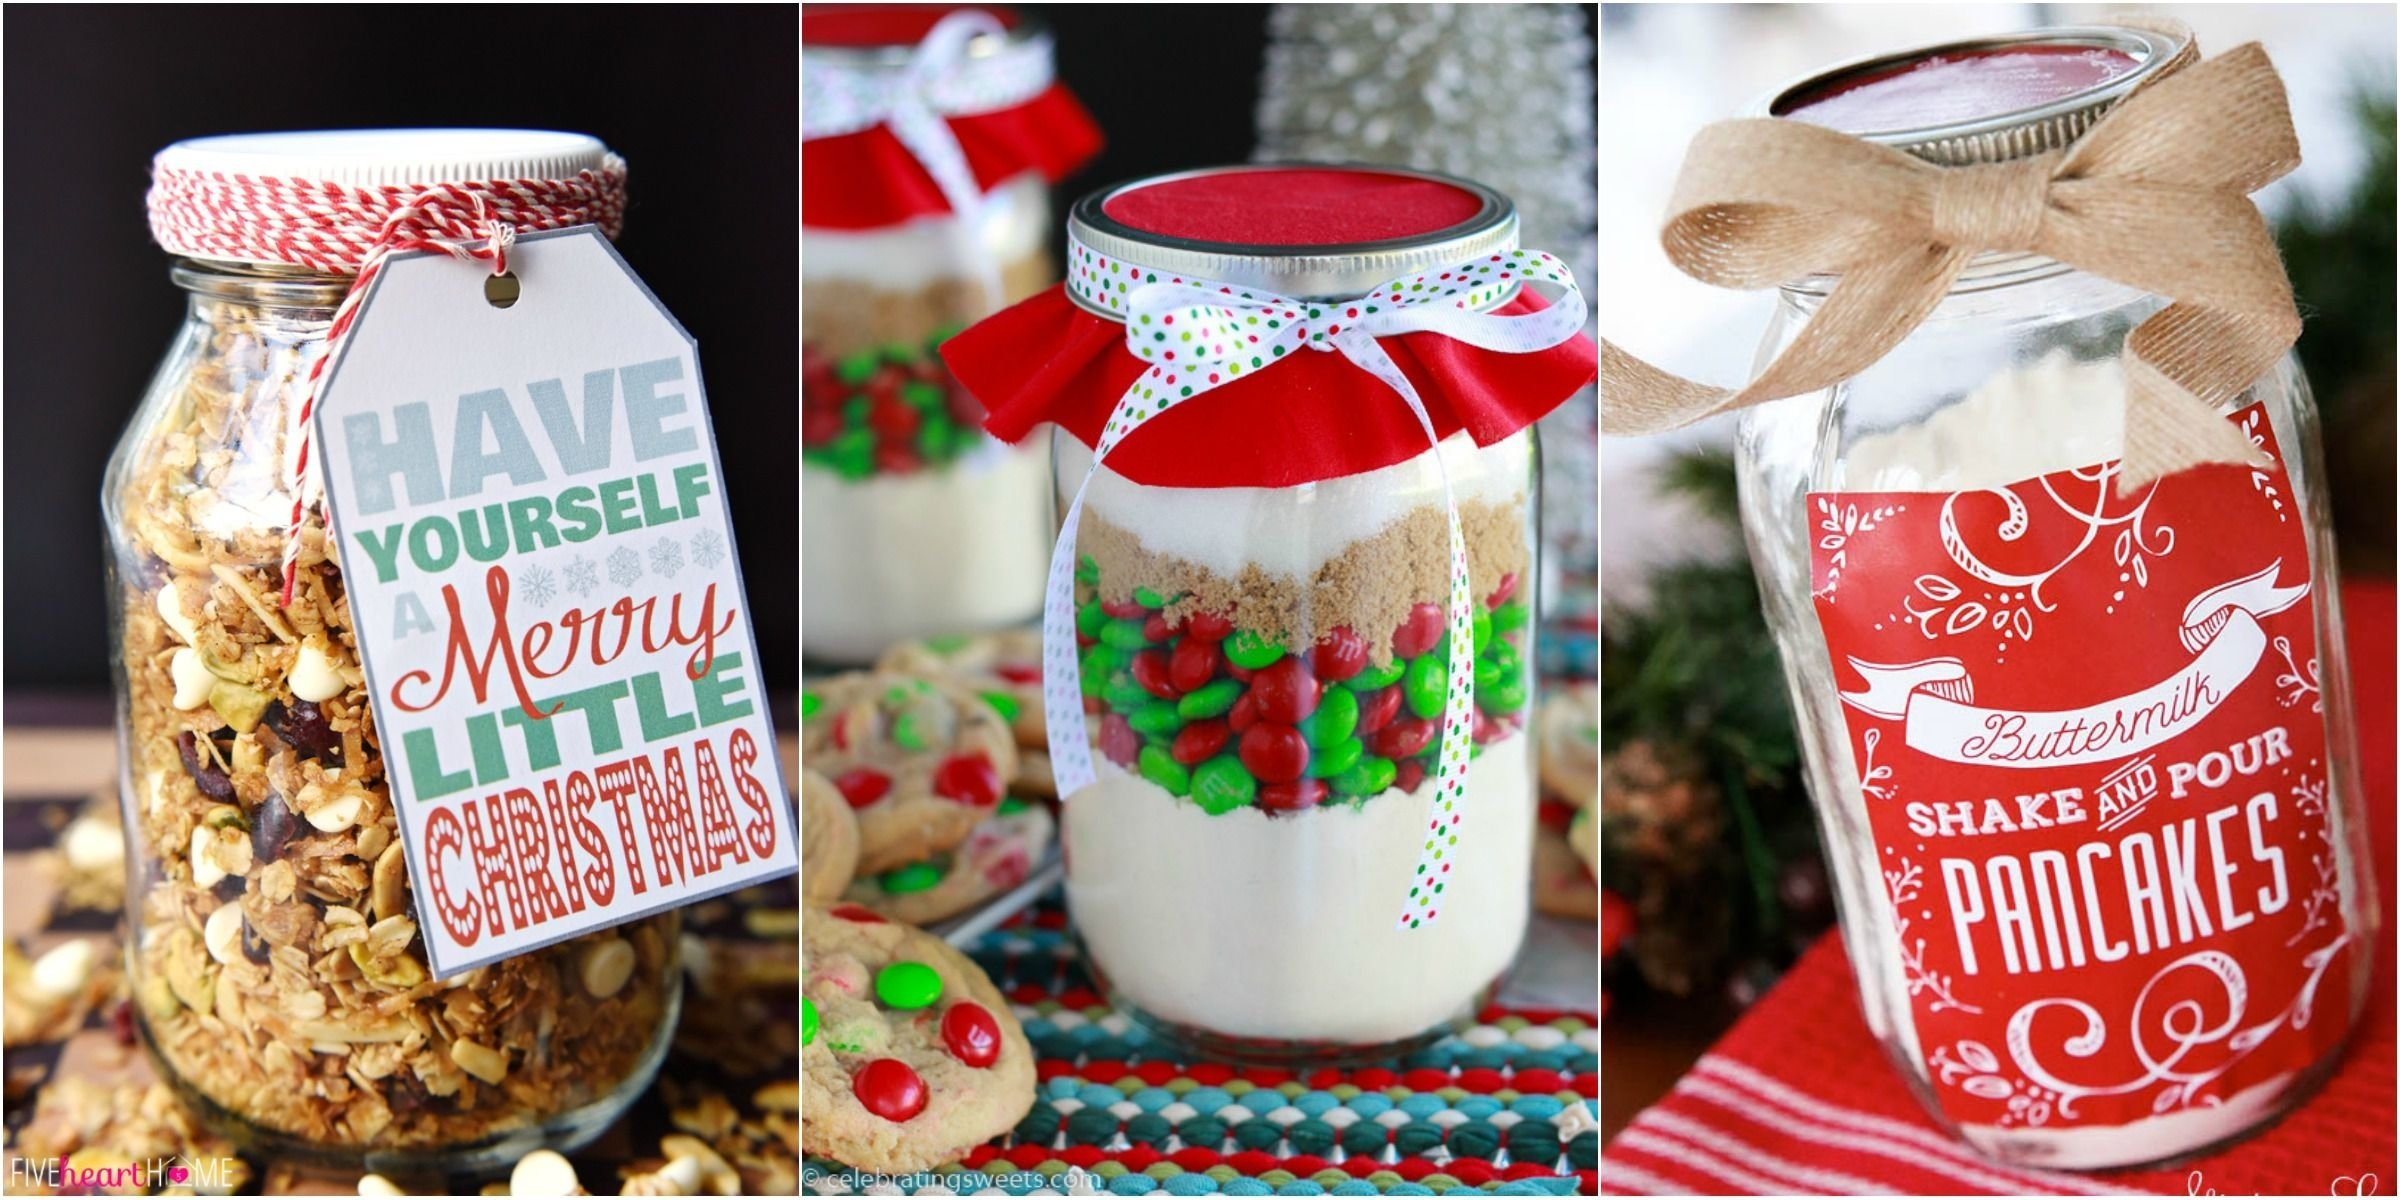 10 Cute Mason Jar Christmas Gift Ideas 34 mason jar christmas food gifts recipes for gifts in a mason jar